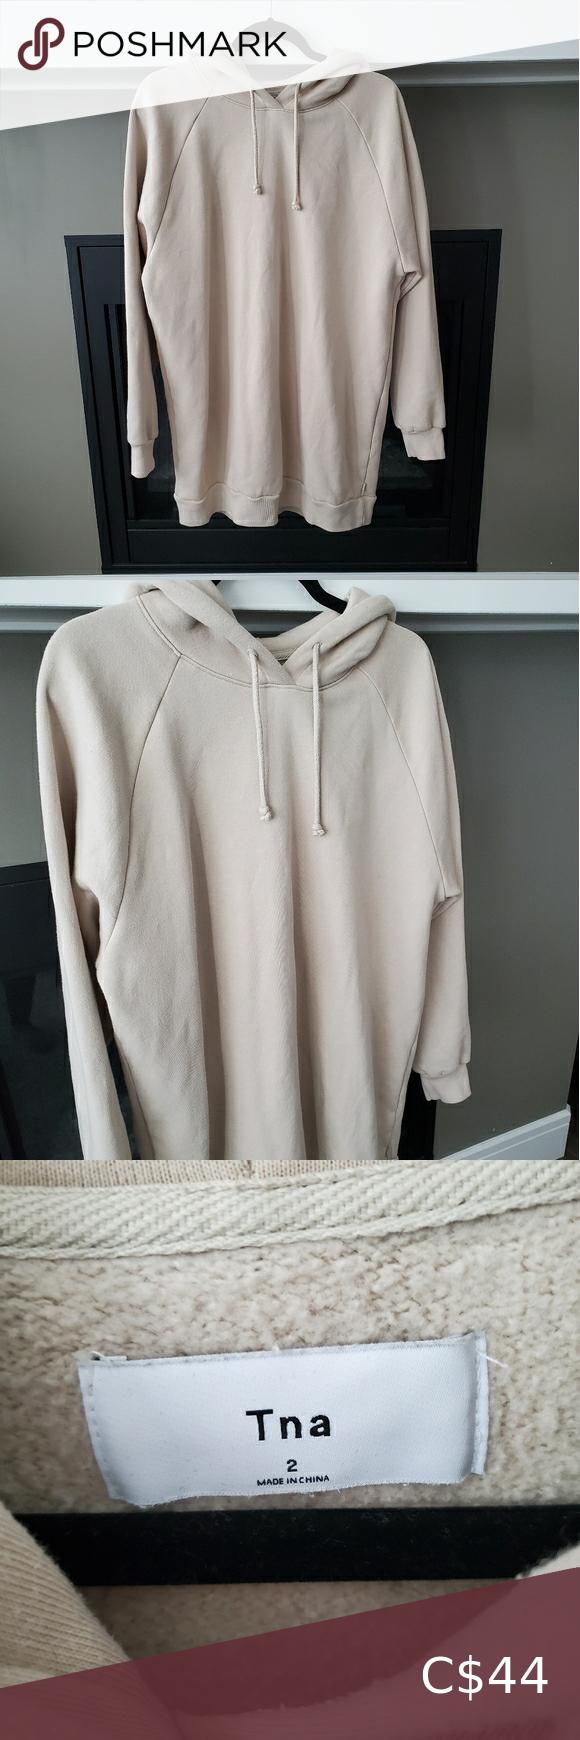 Aritzia TNA Venta Sweater Dress Size 2 An oversized fleece